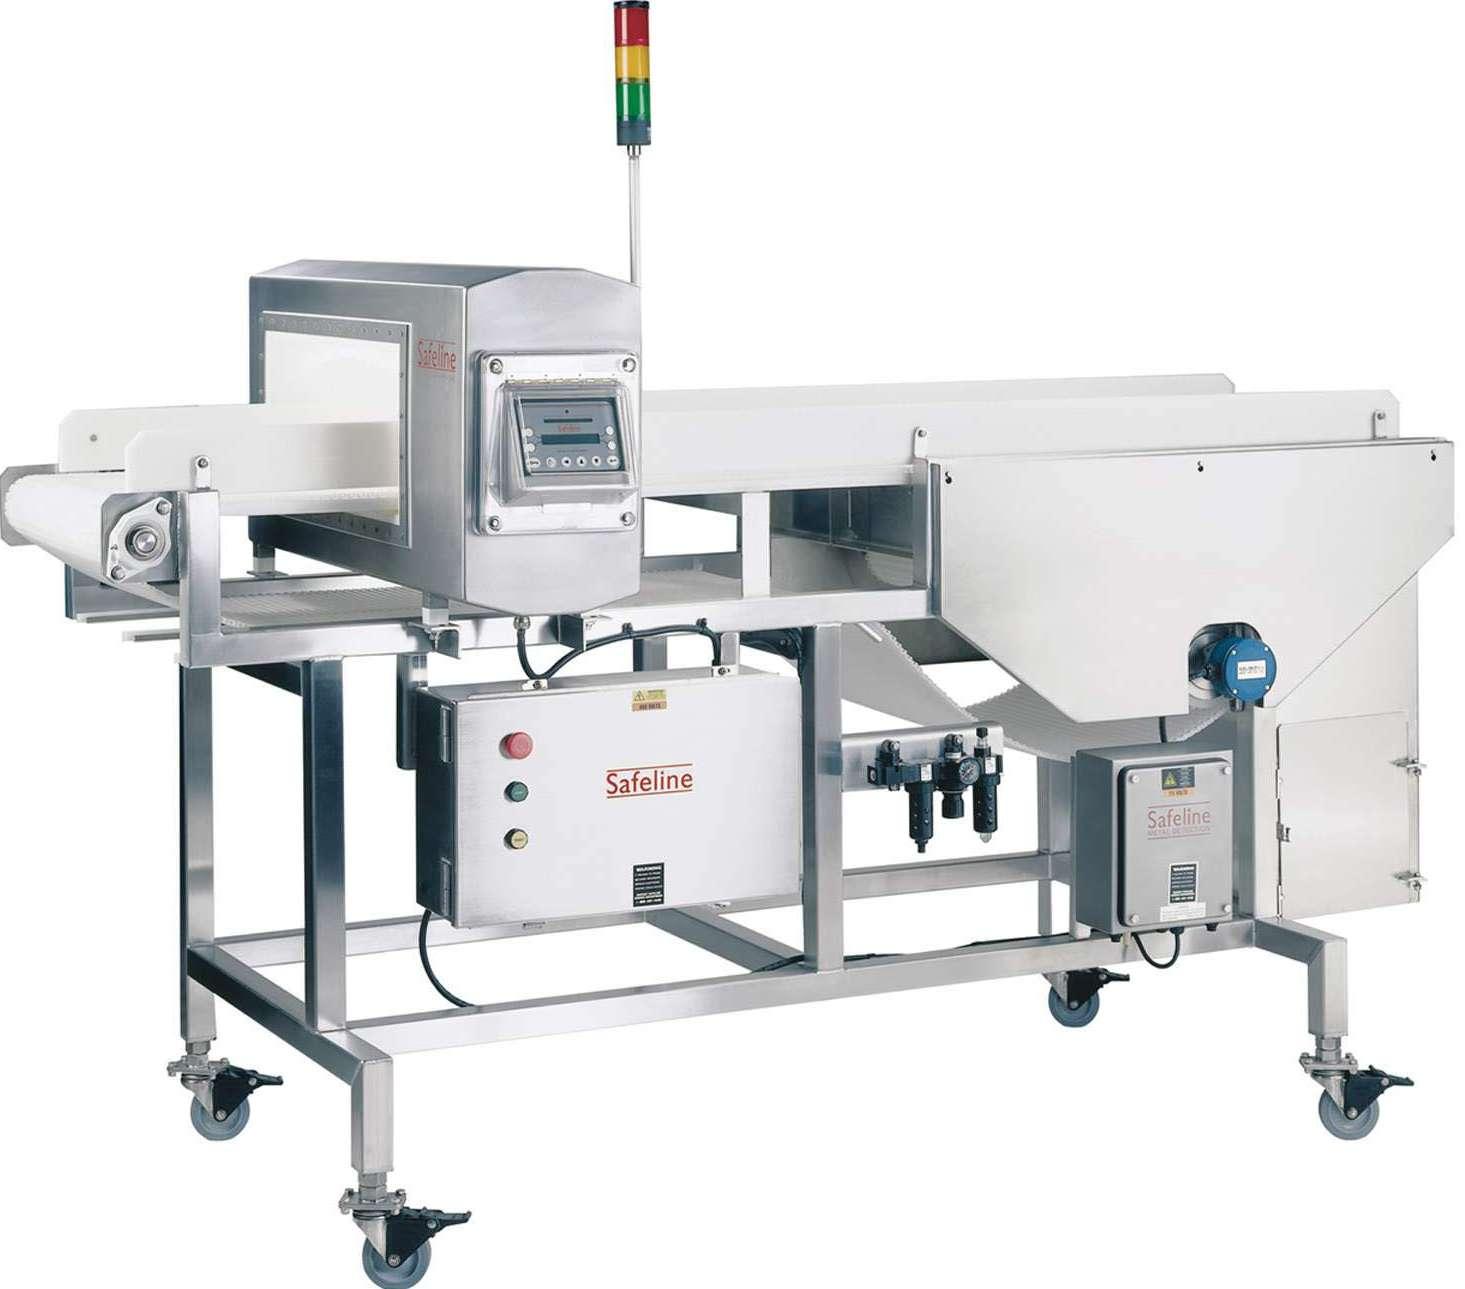 Safeline 39 s powerphase metal detectors for fresh cut - Estructuras de metal ...